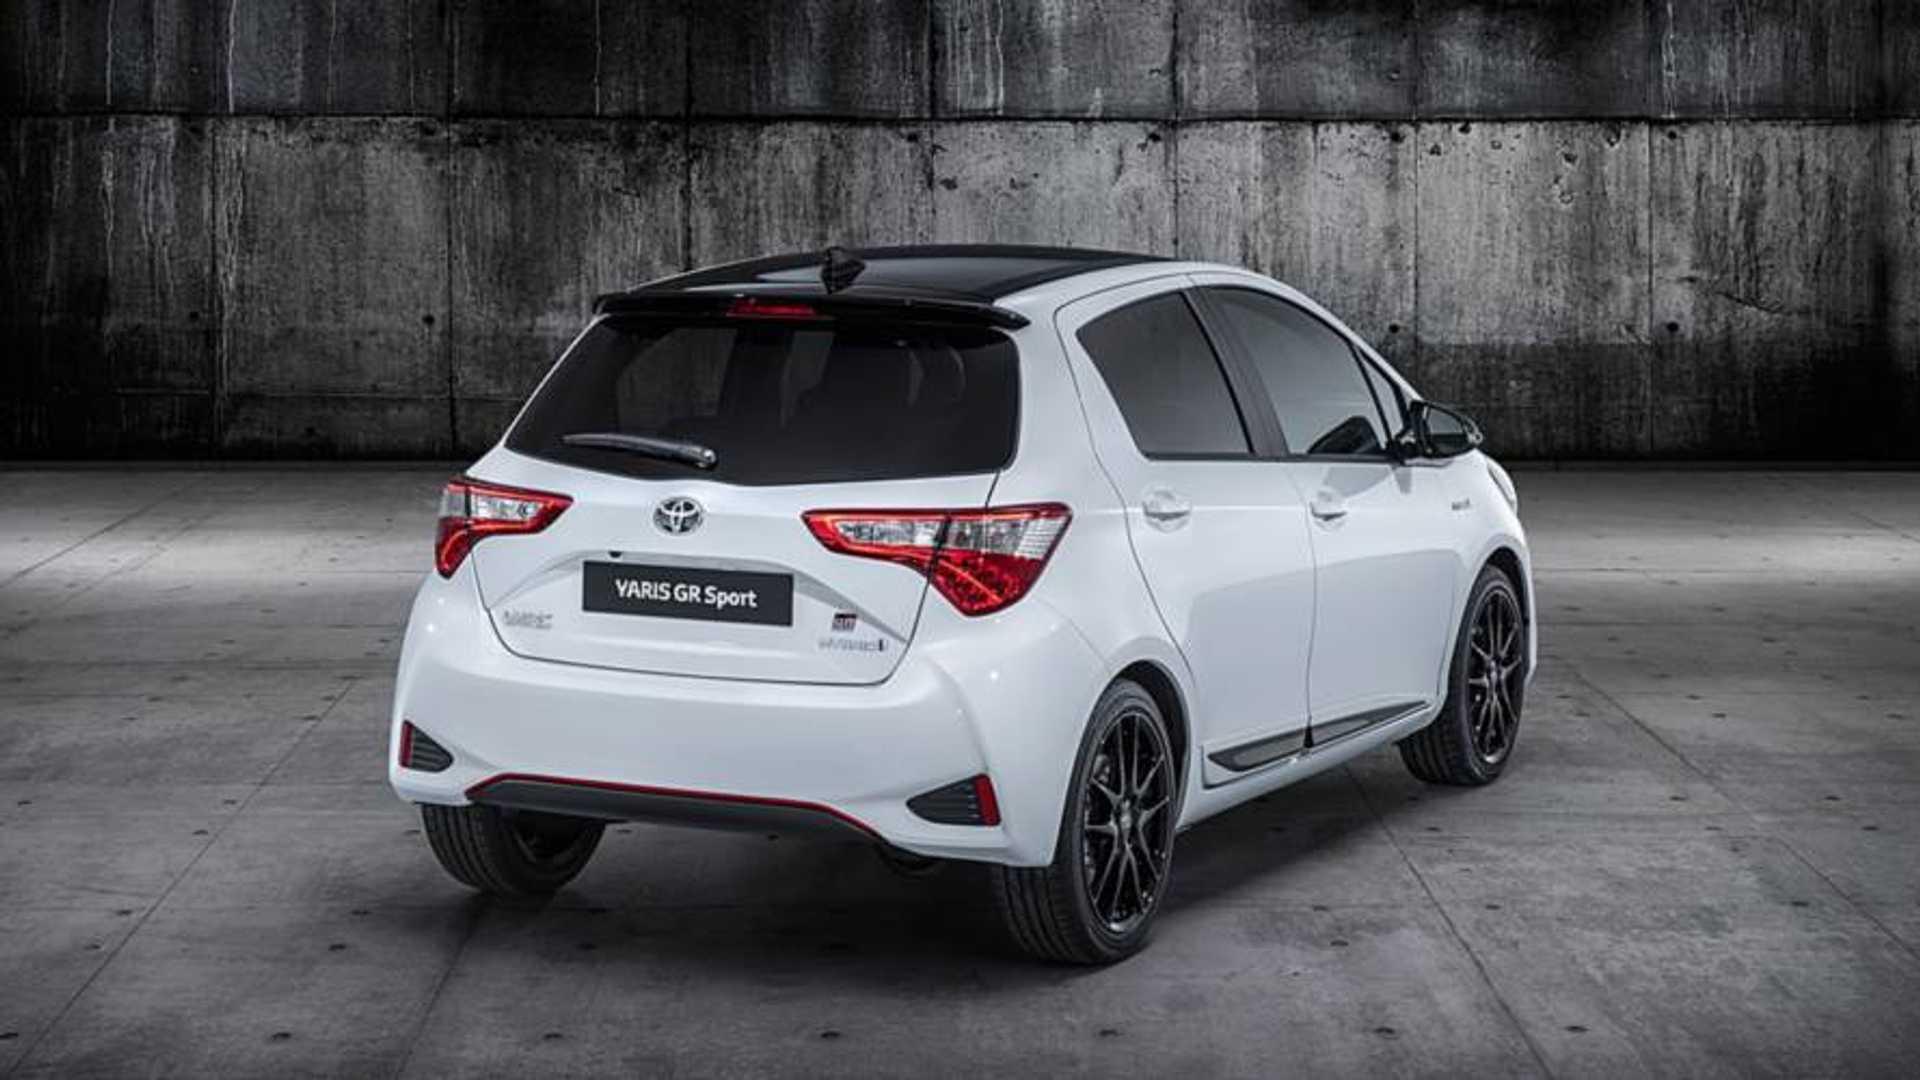 Toyota Yaris GR Sport Sapa Pasar Eropa Dengan Tampang Sporty